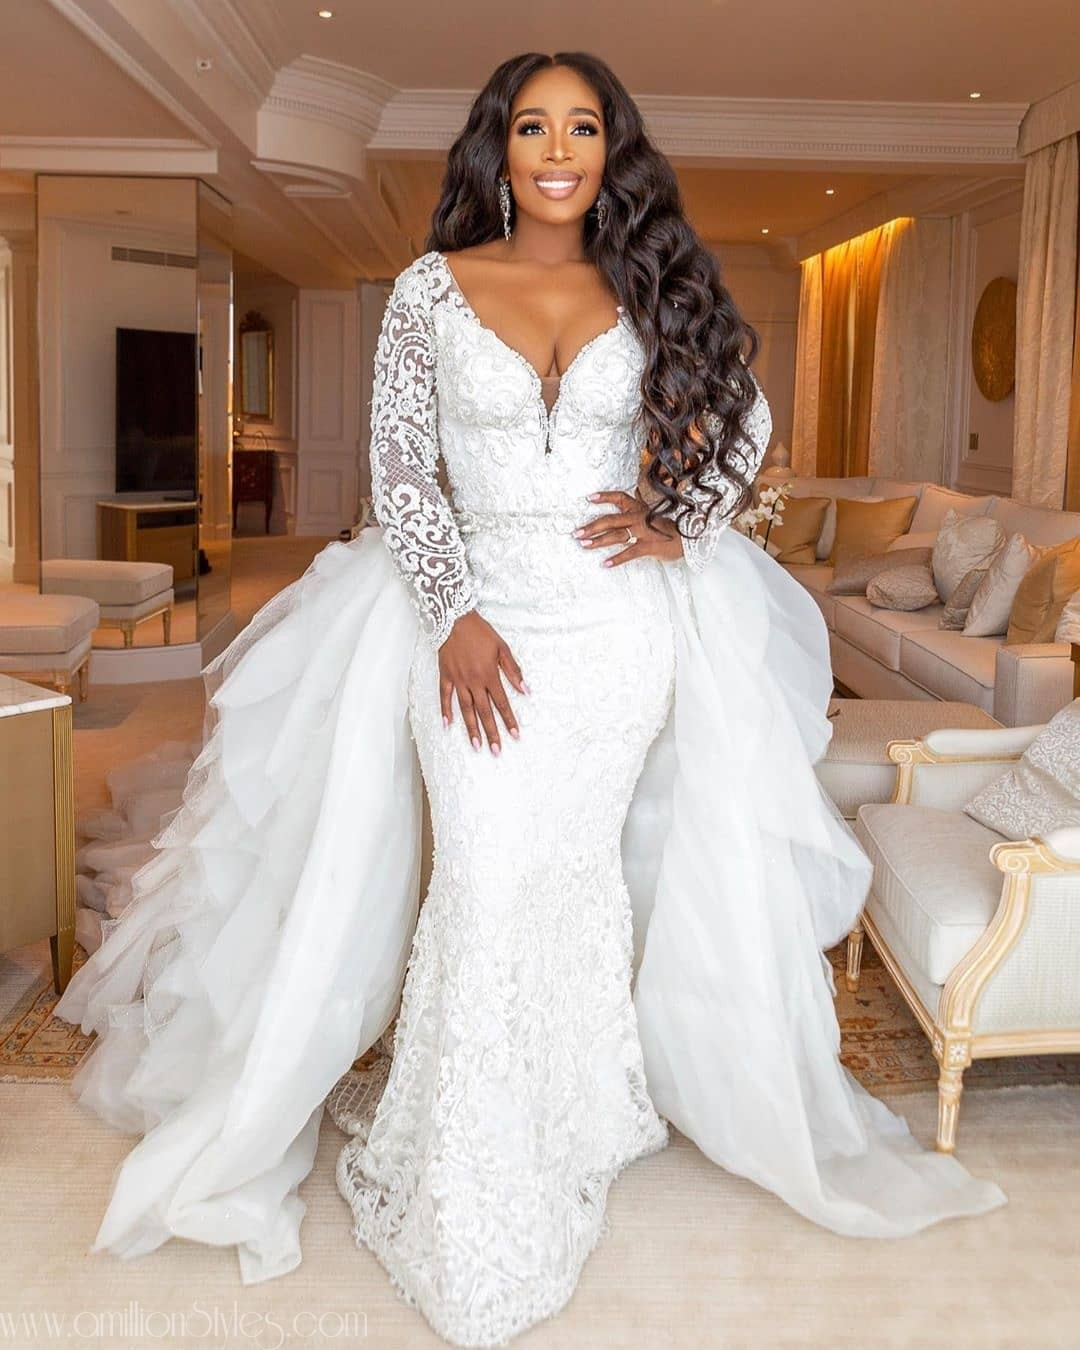 Brides Are Pushing The Envelopes With These Stylish 2019 Wedding Dresses